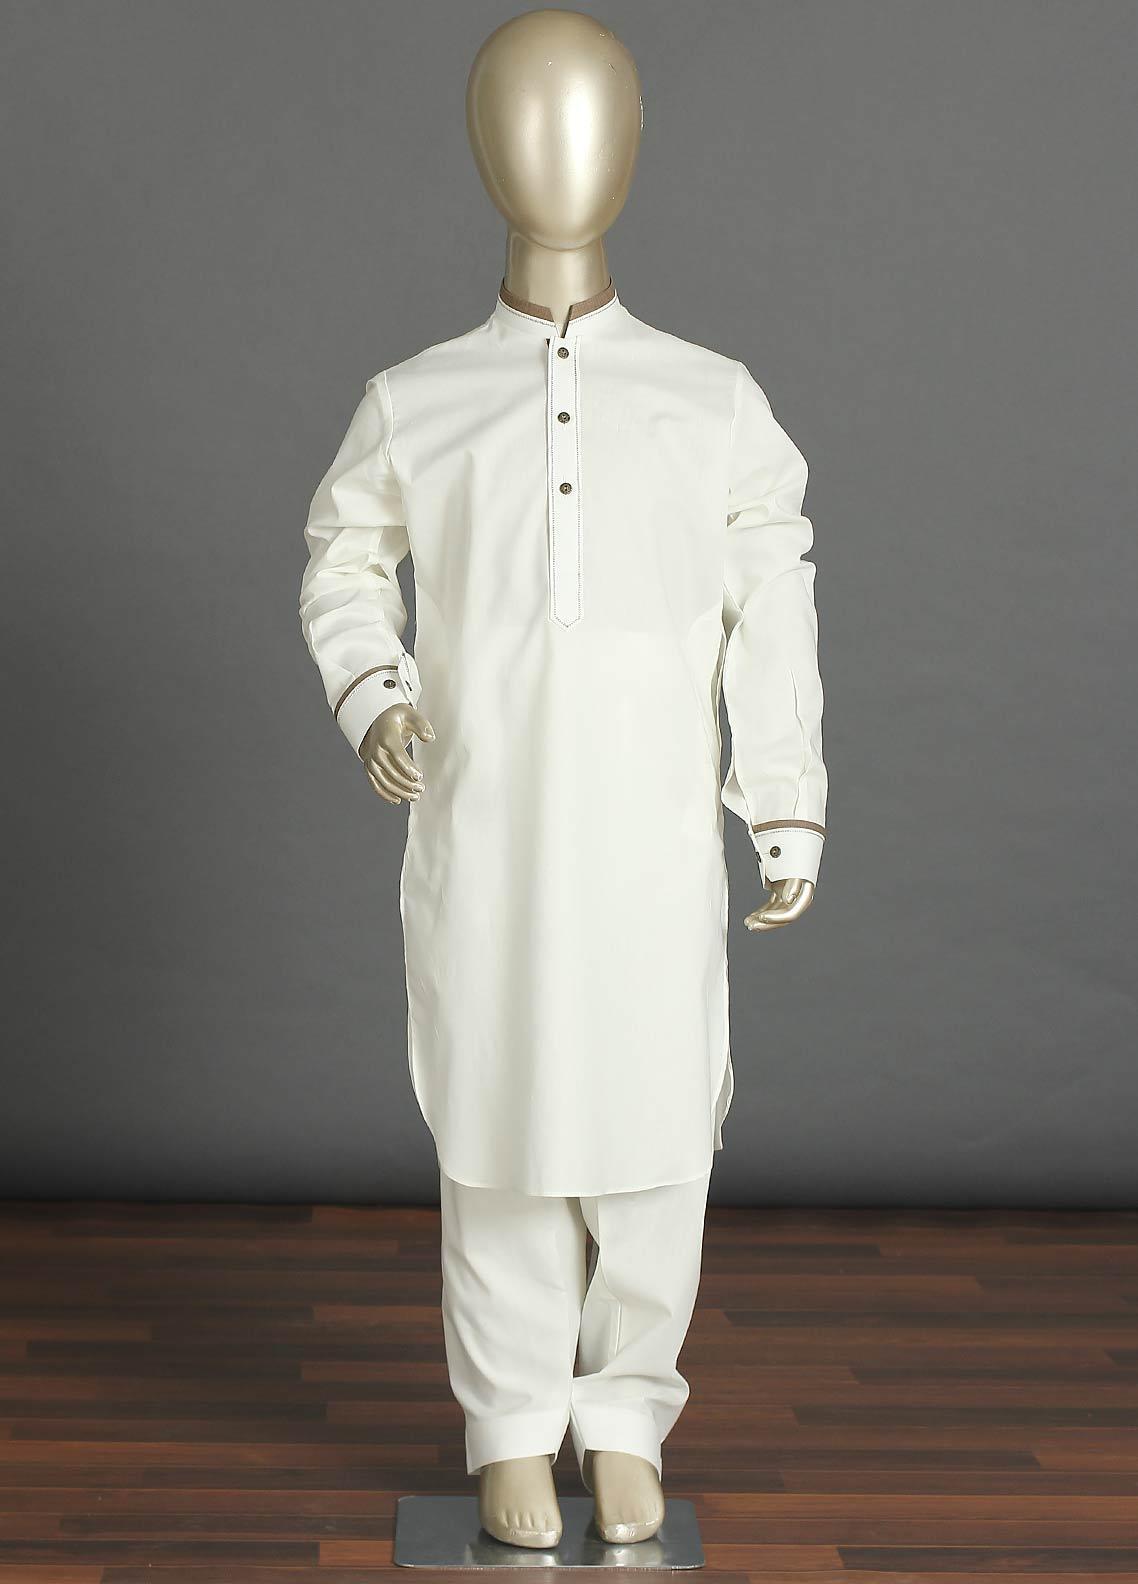 Aizaz Zafar Cotton Formal Kameez Shalwar for Boys - 238 Off White